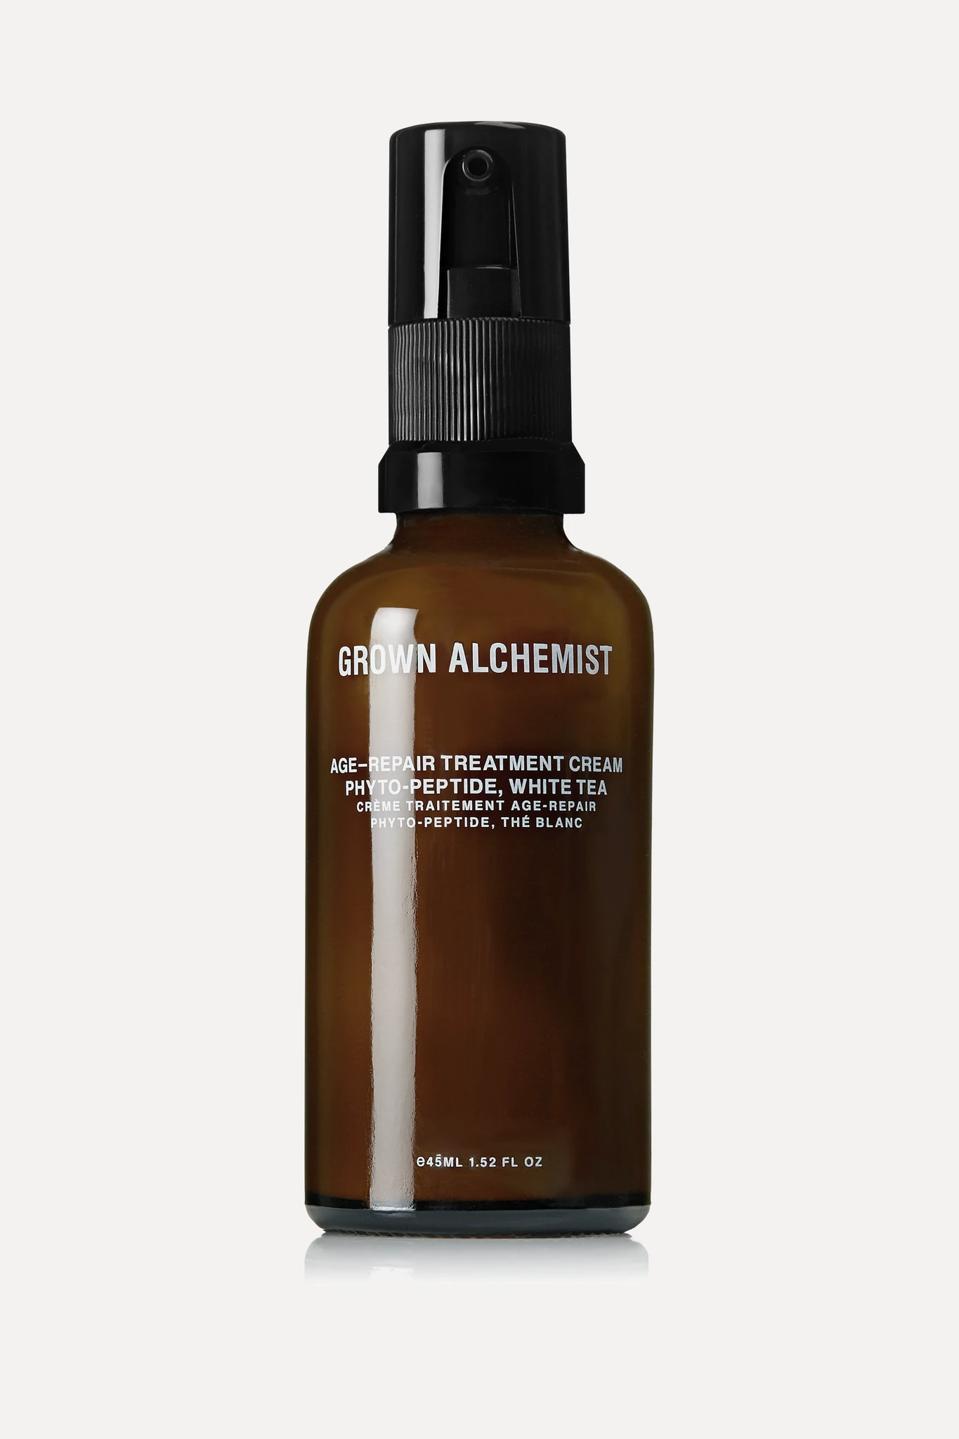 Grown Alchemist Colorless Age-Repair Treatment Cream